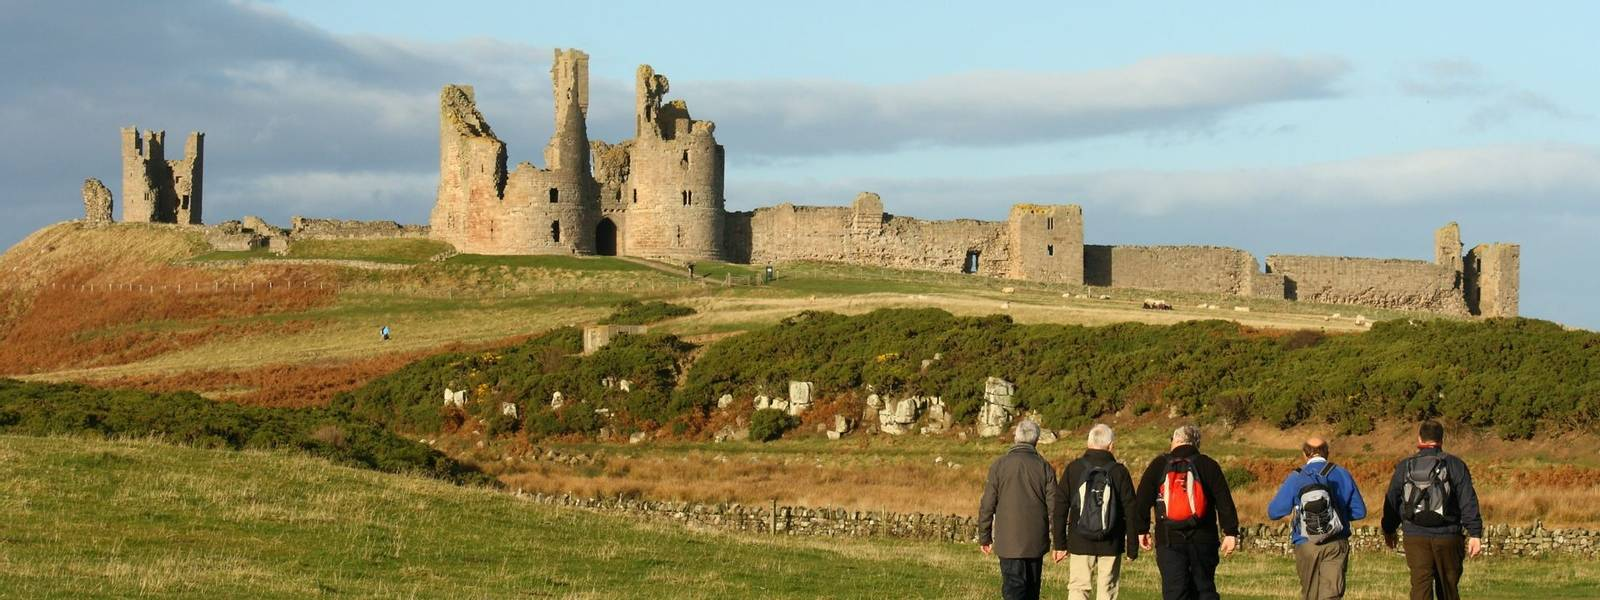 Alnmouth - Walking with Sightseeing - Craster - Dunstanburgh Castle - AdobeStock_46809622.jpeg